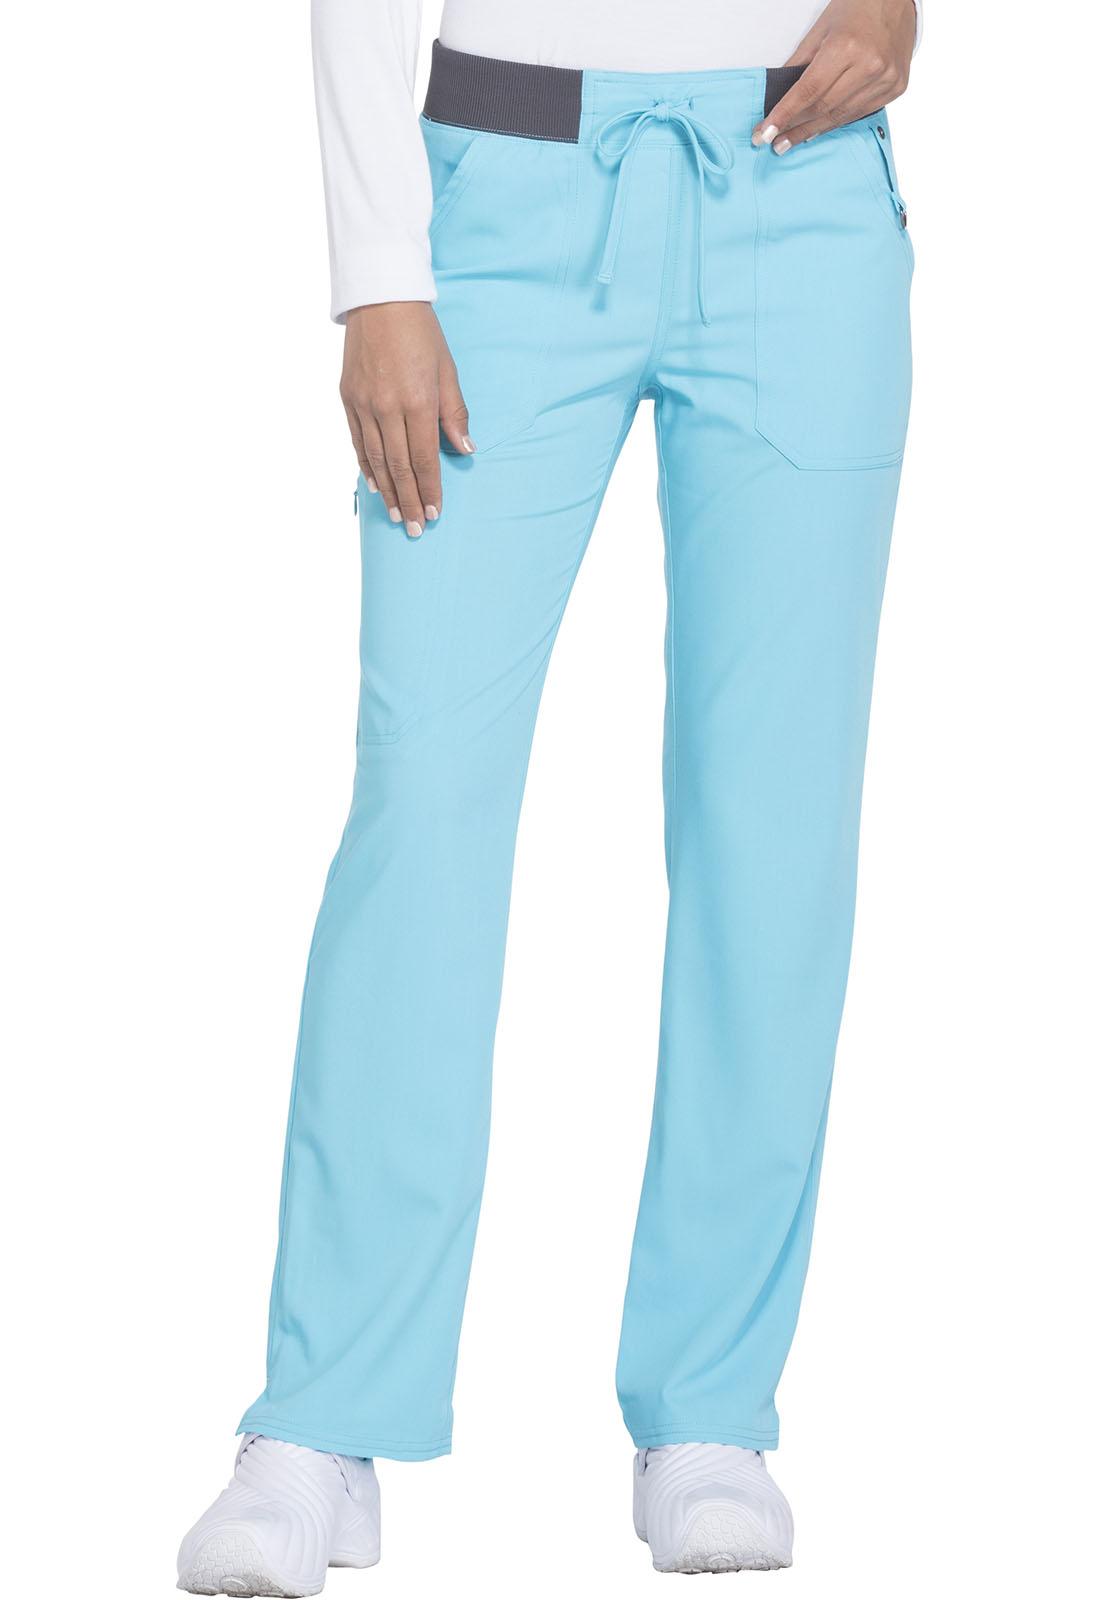 eab9a08bc7f Xtreme Stretch Women's Mid Rise Straight Leg Drawstring Pant Blue